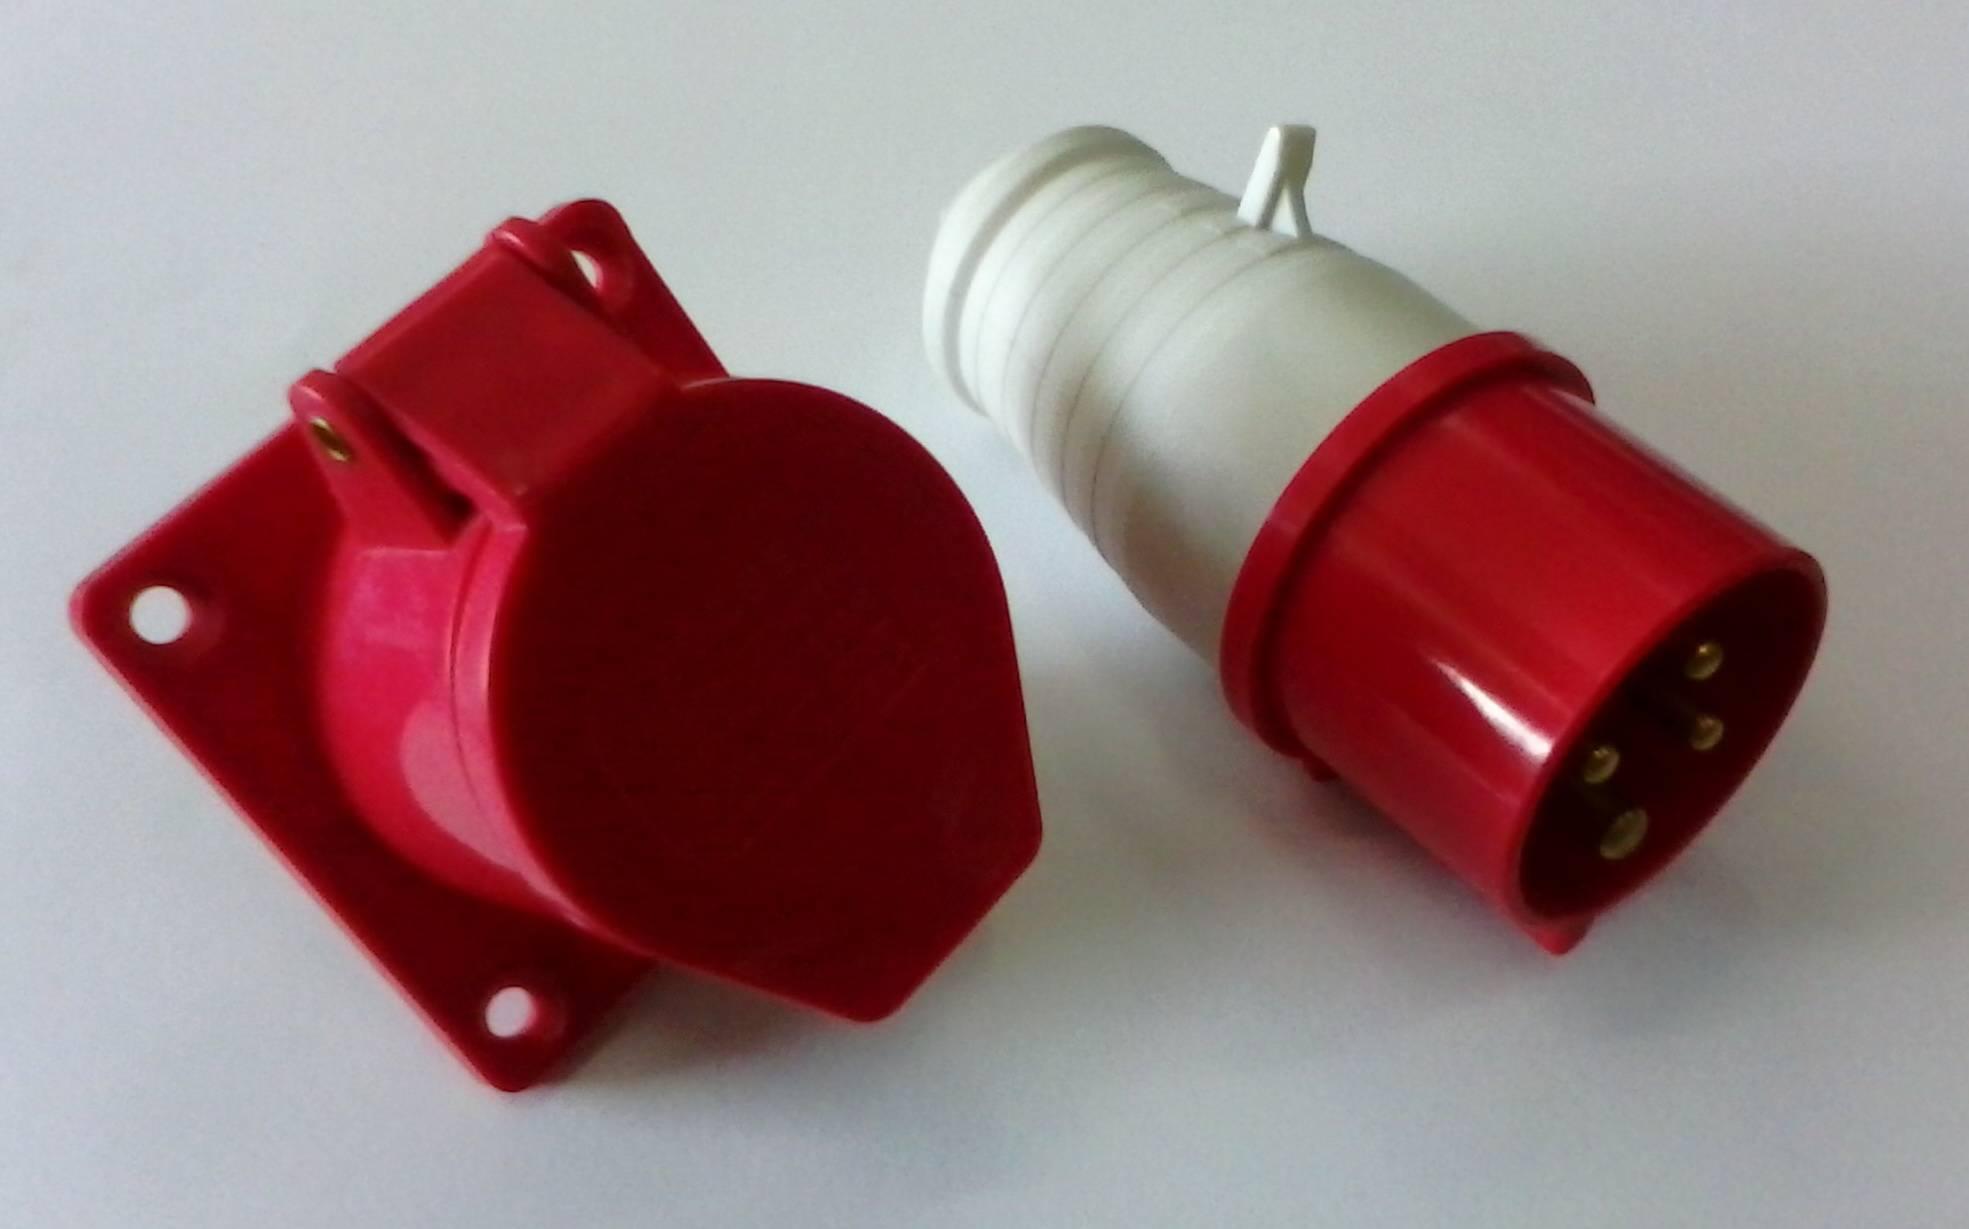 pc coupling plug/socket